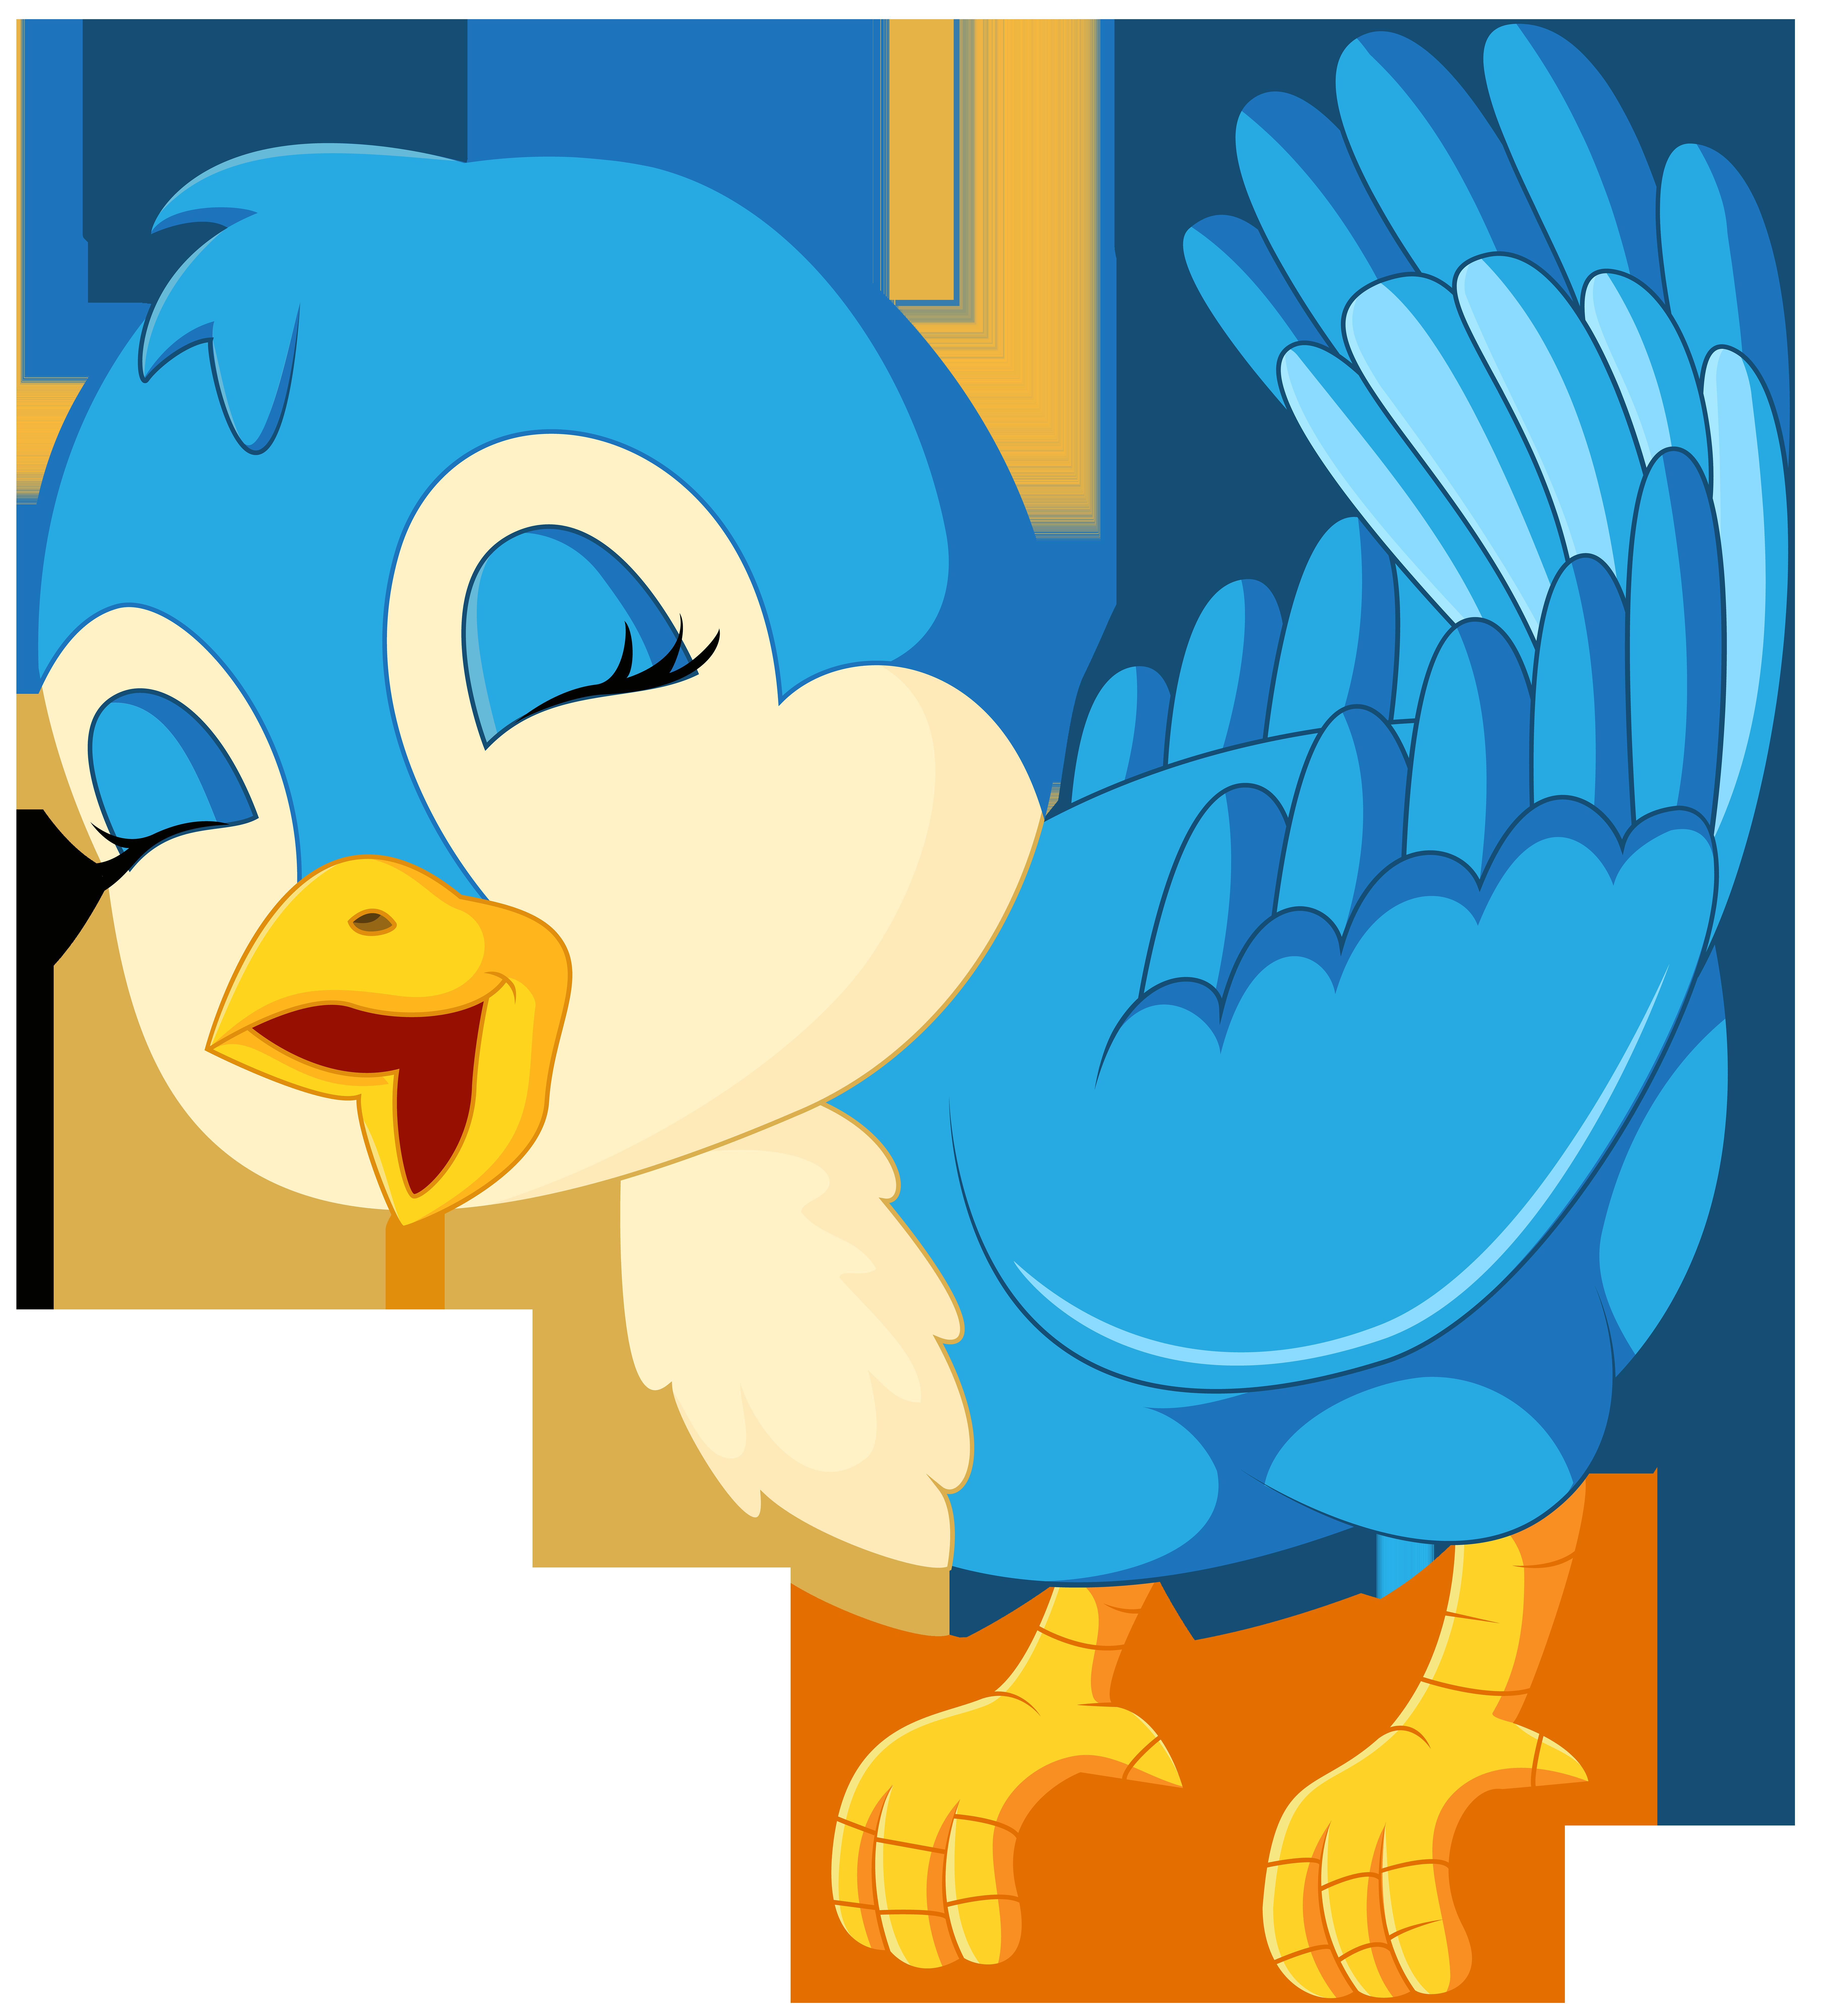 Blue Bird Cartoon PNG Clip Art Image.